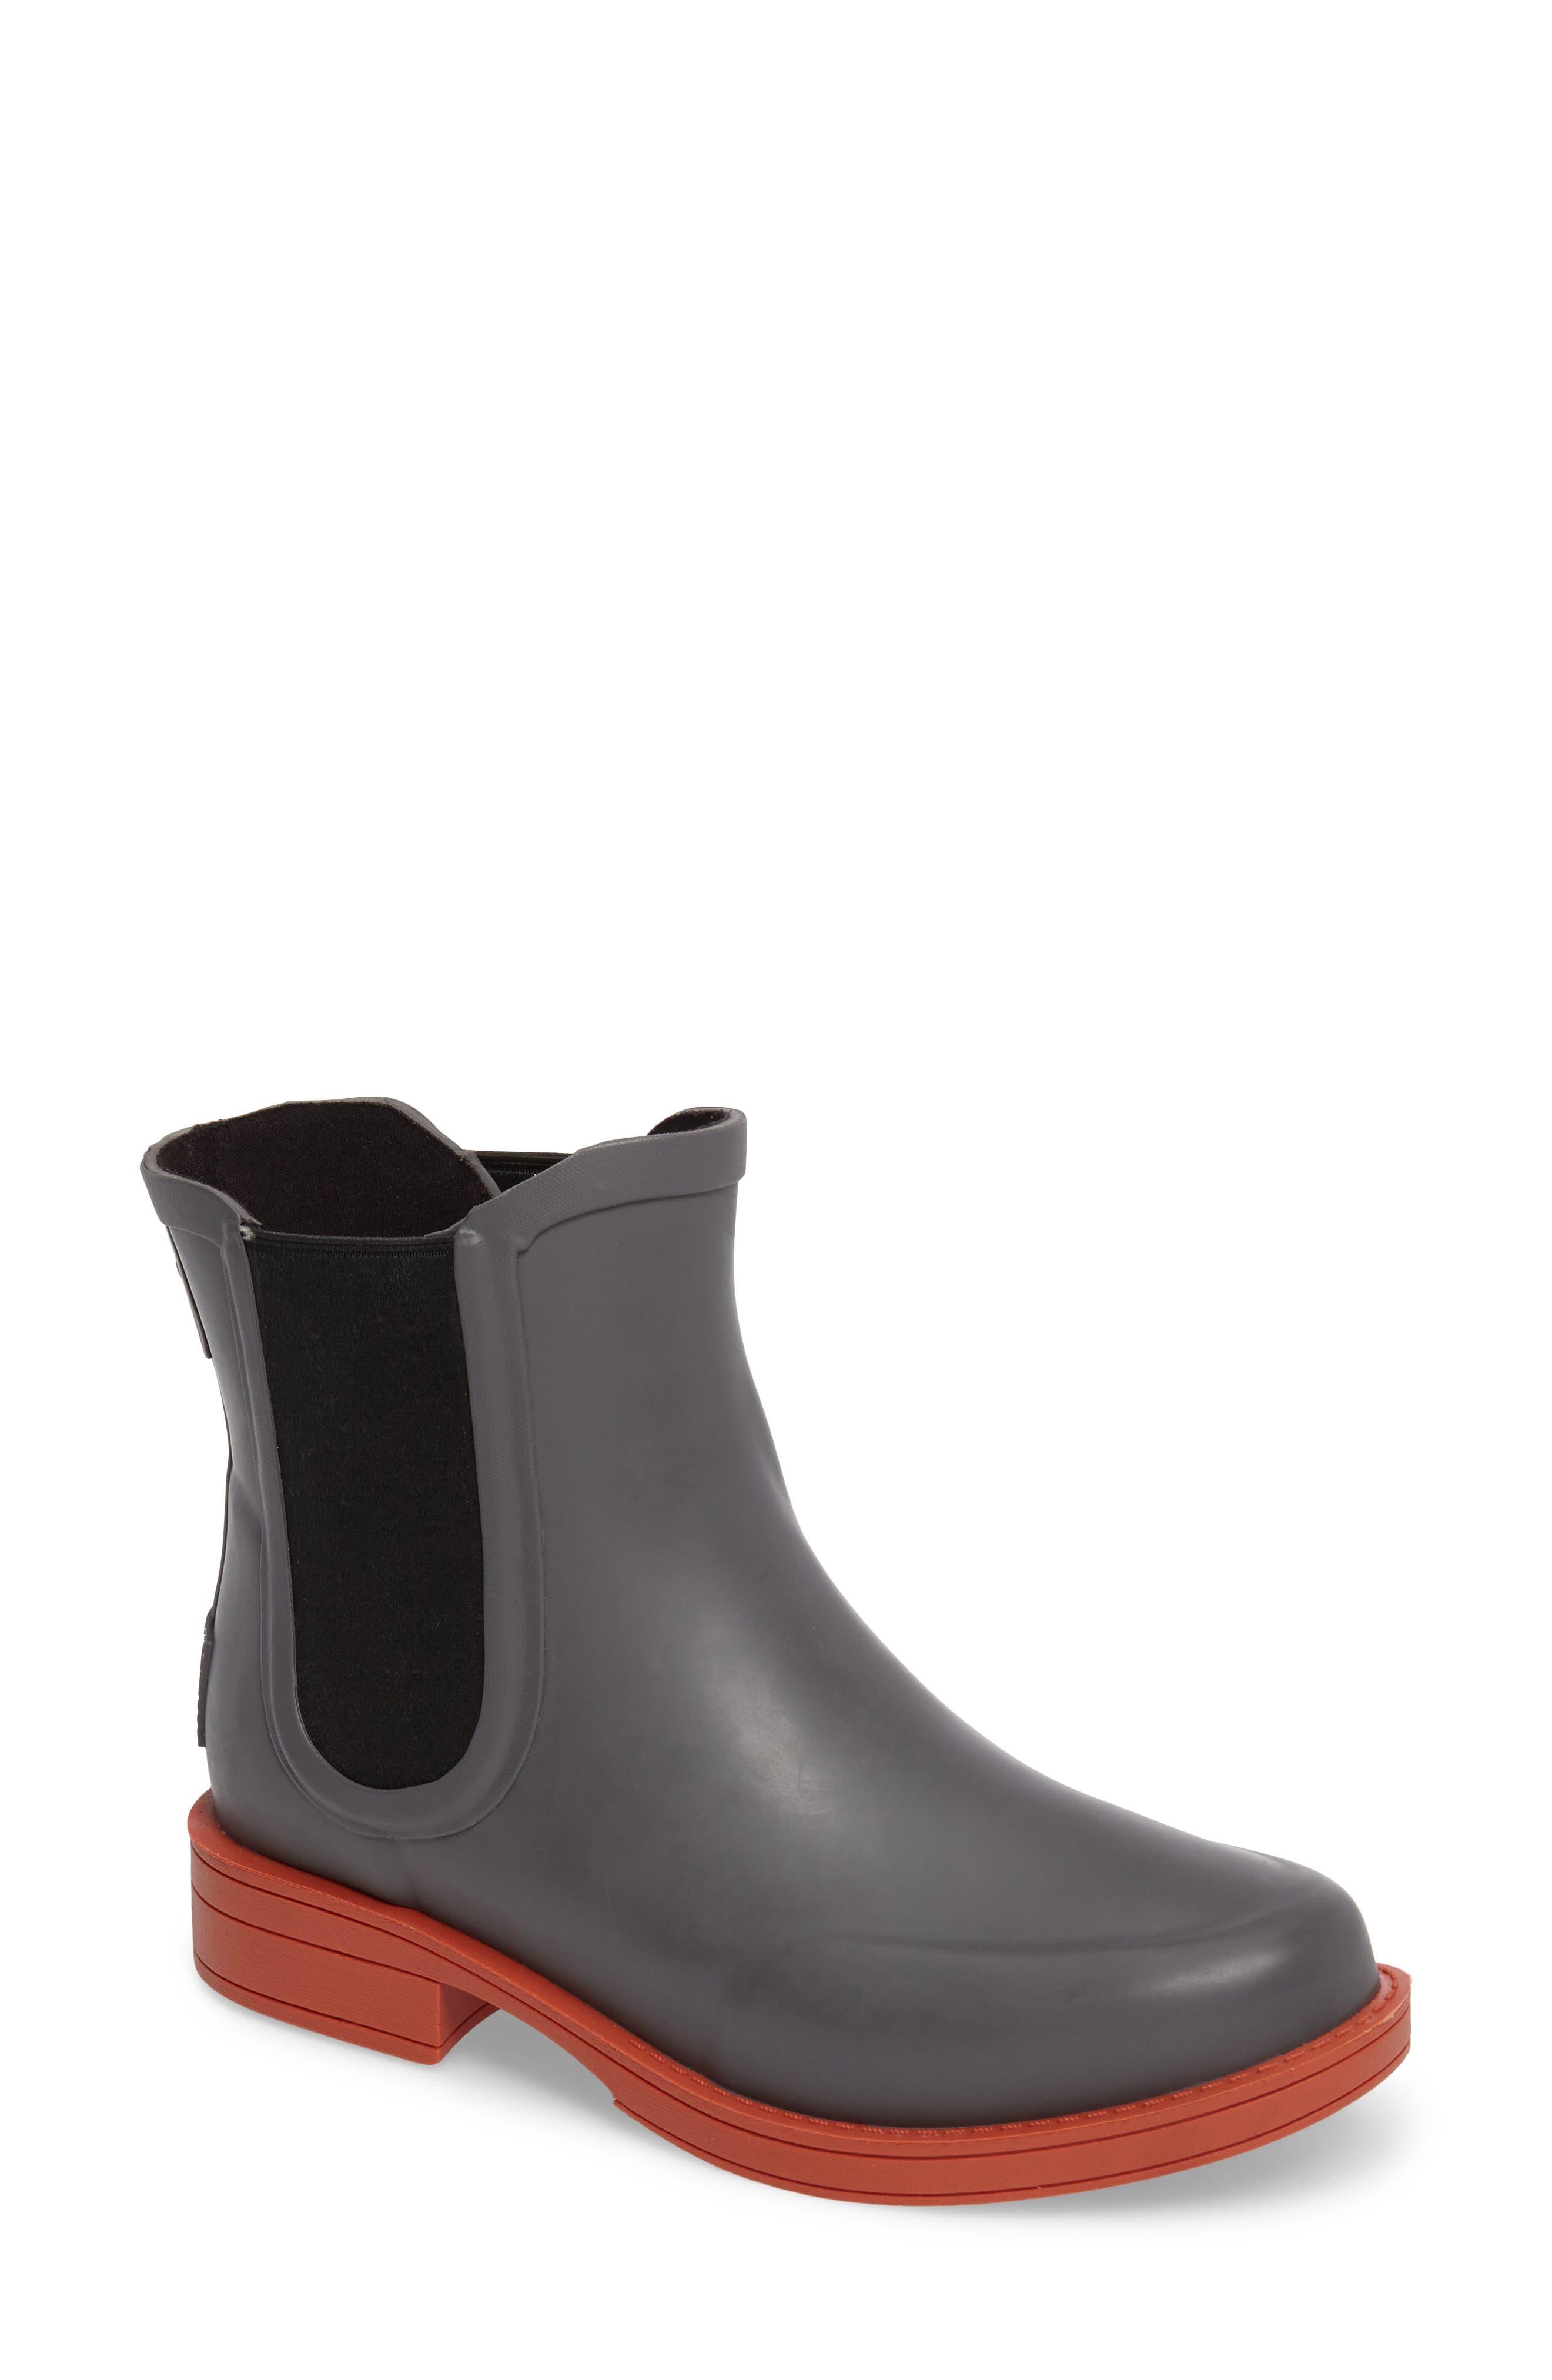 Alternate Image 1 Selected - UGG® Aviana Chelsea Rain Boot (Women)